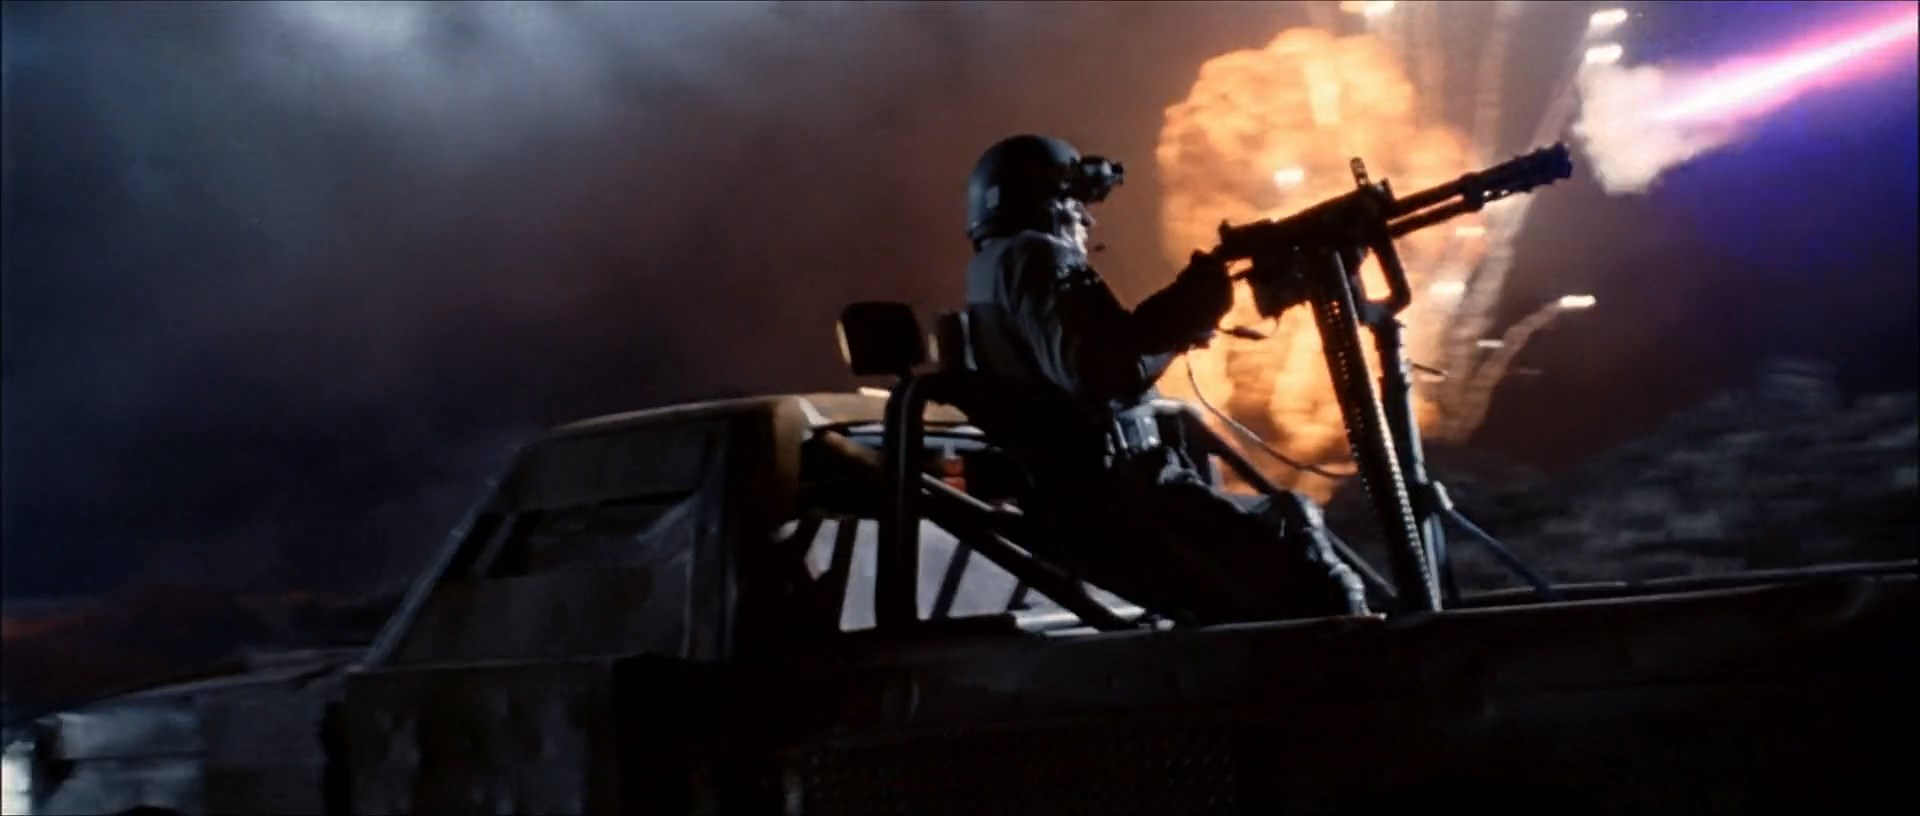 File:T2 Resistance Plasma Minigun.JPG